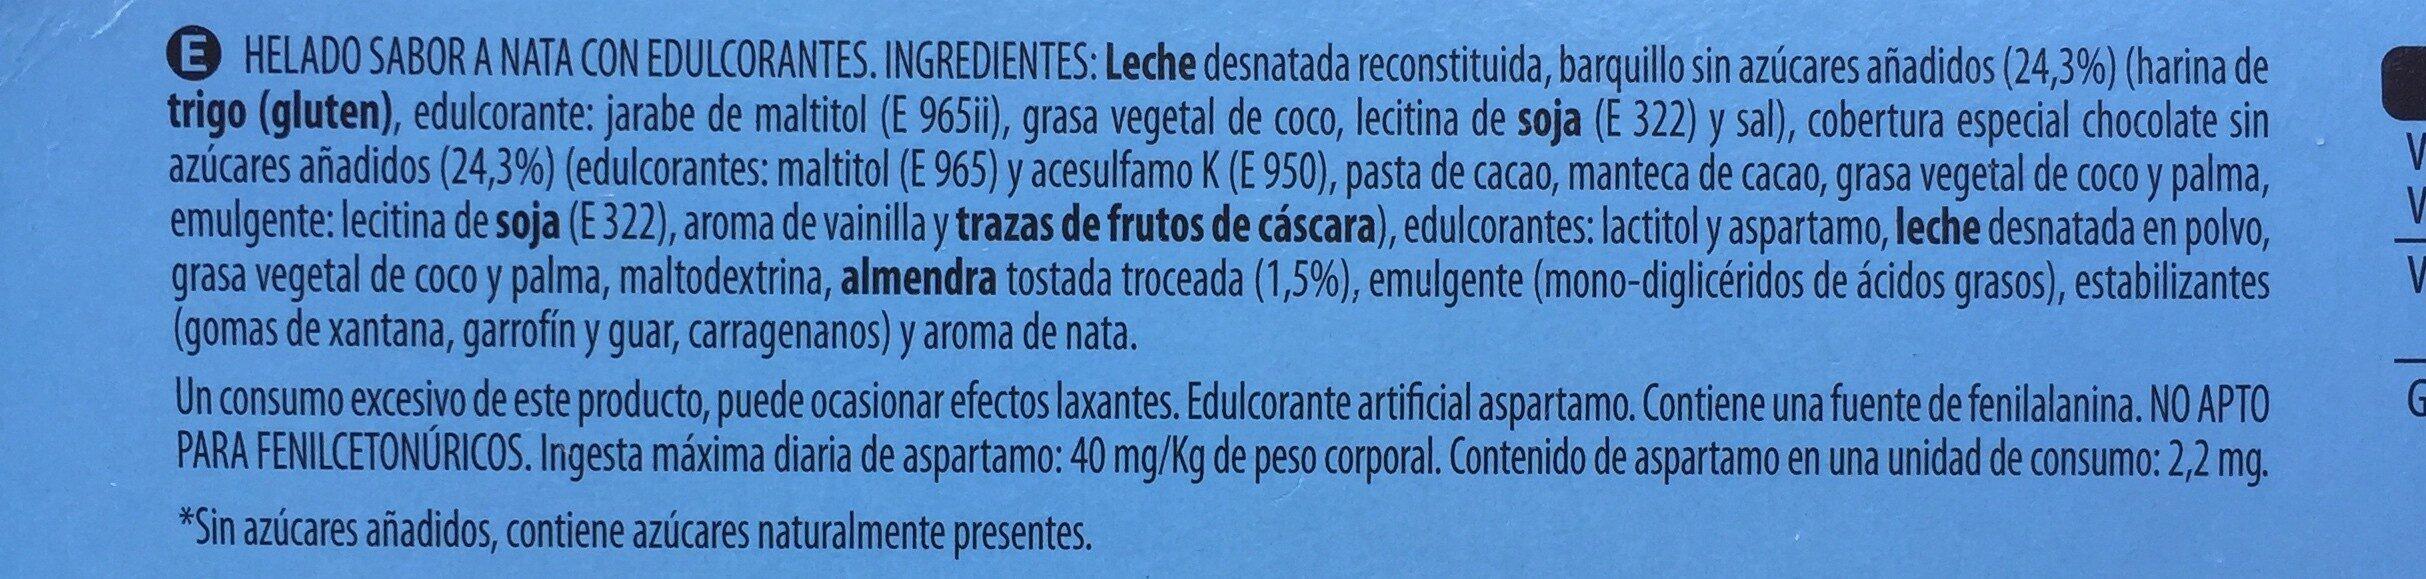 Mini Nata - Ingredients - es